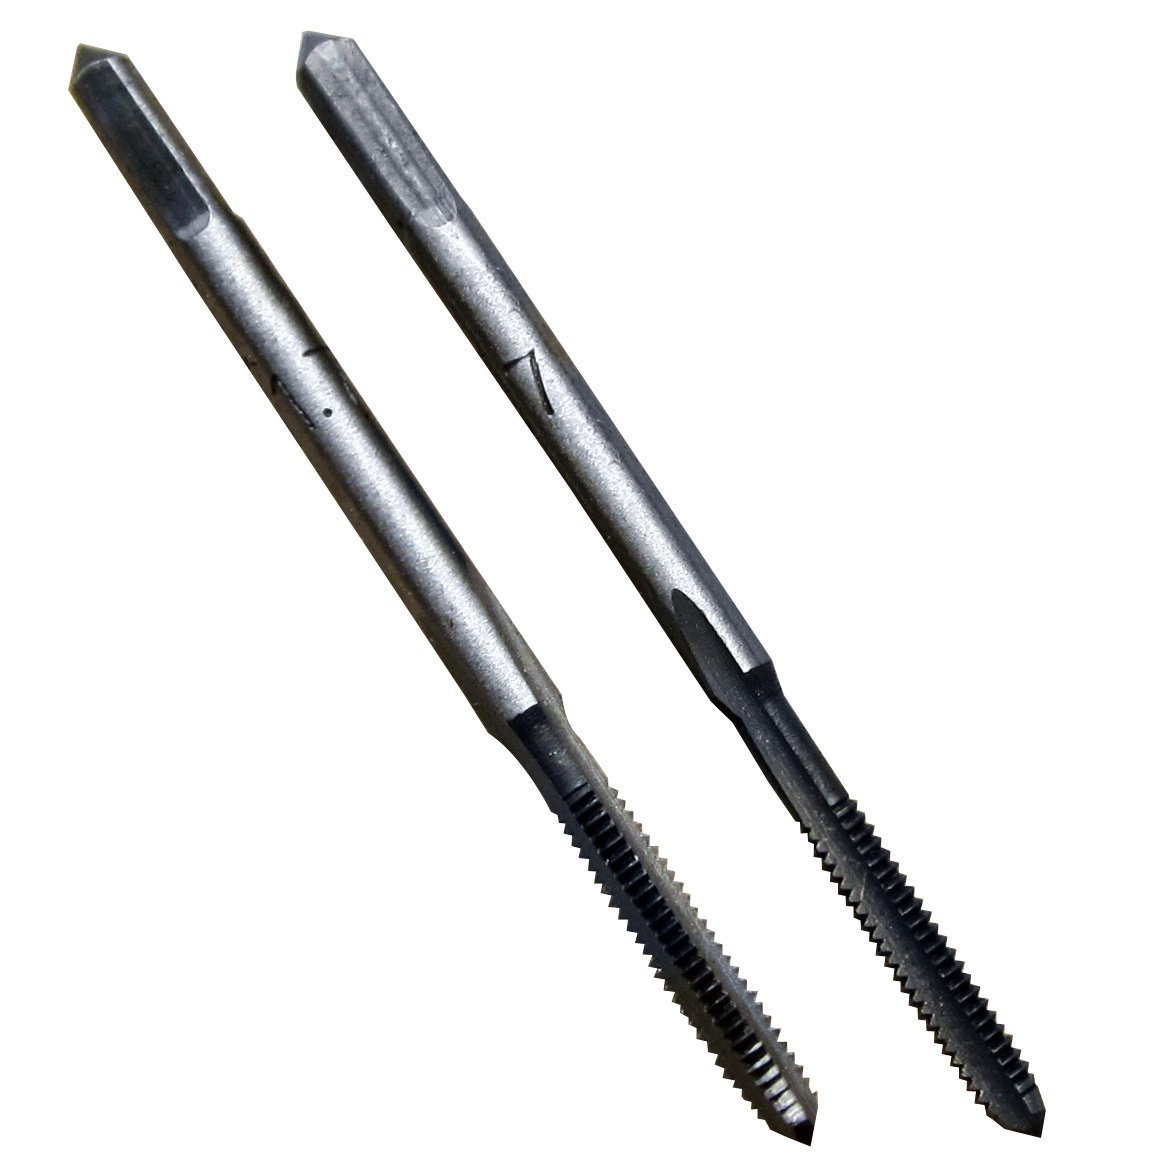 M7 x 1.0mm Metric Taper and Plug Taps